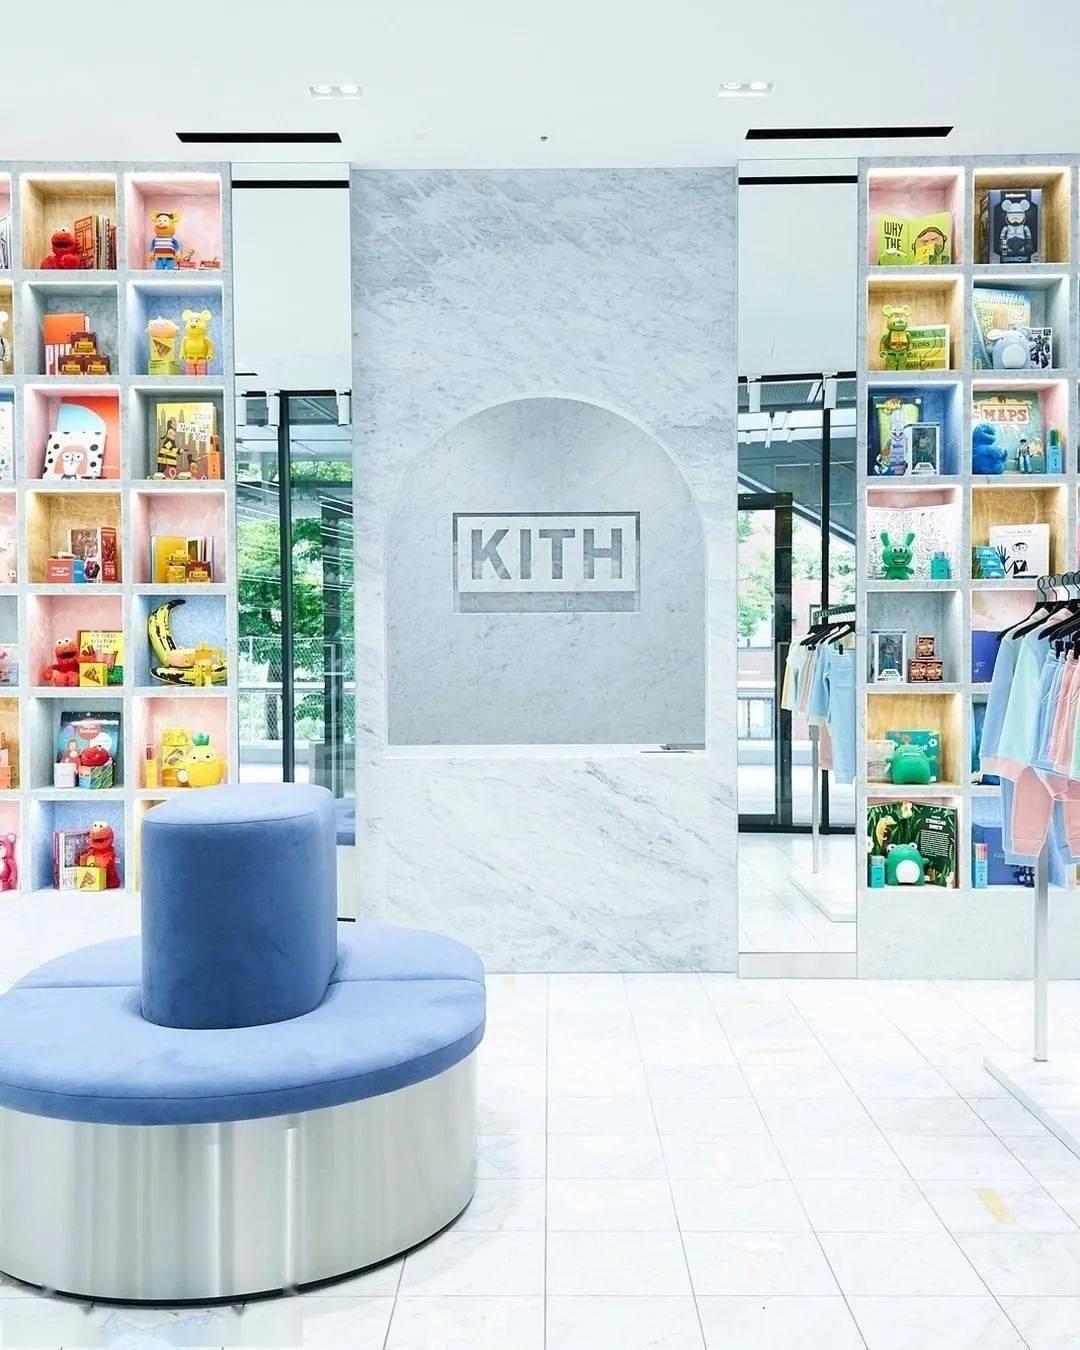 LV 涩谷新店直击 | KITH东京旗舰店开幕 Daniel Araham x Pokémon 展览回顾  span class=